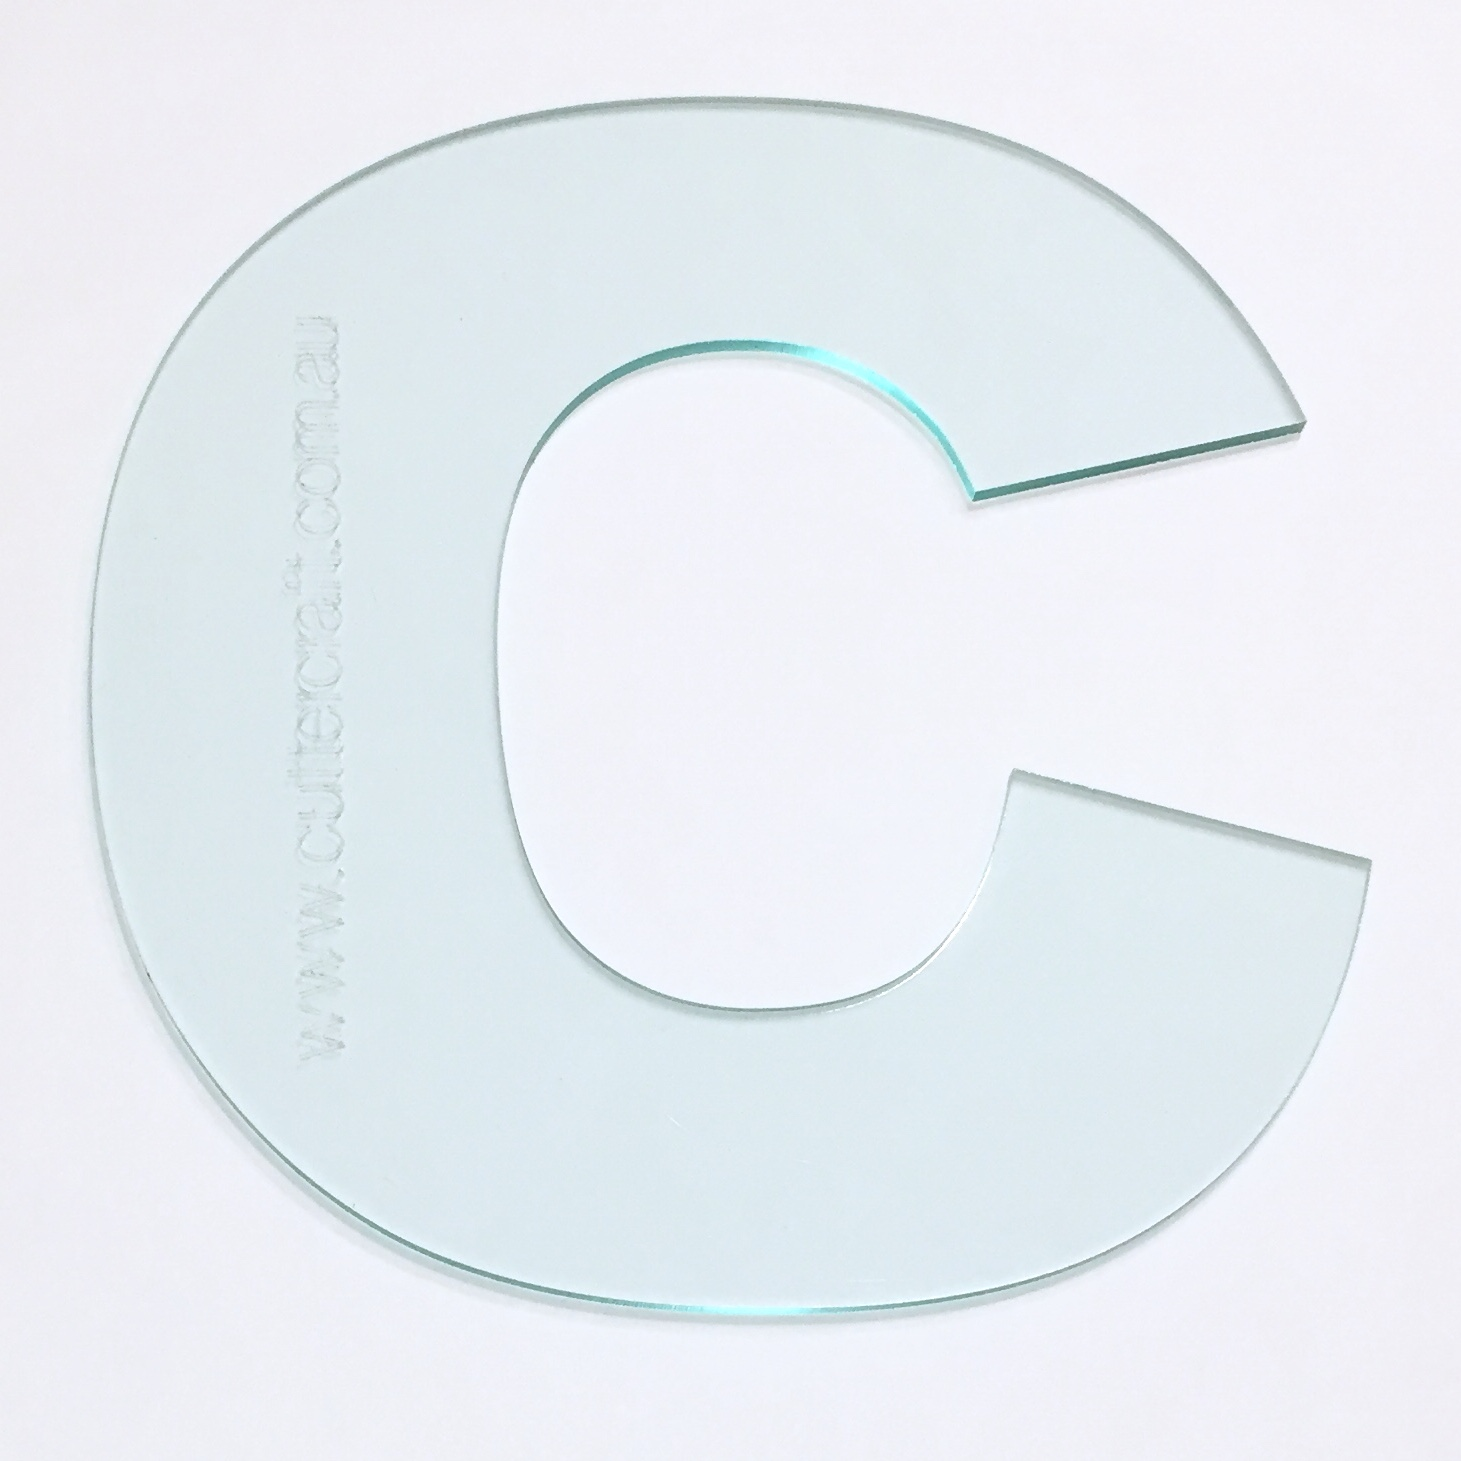 Letter C acrylic large template 29cm high ~ wide font - CutterCraft